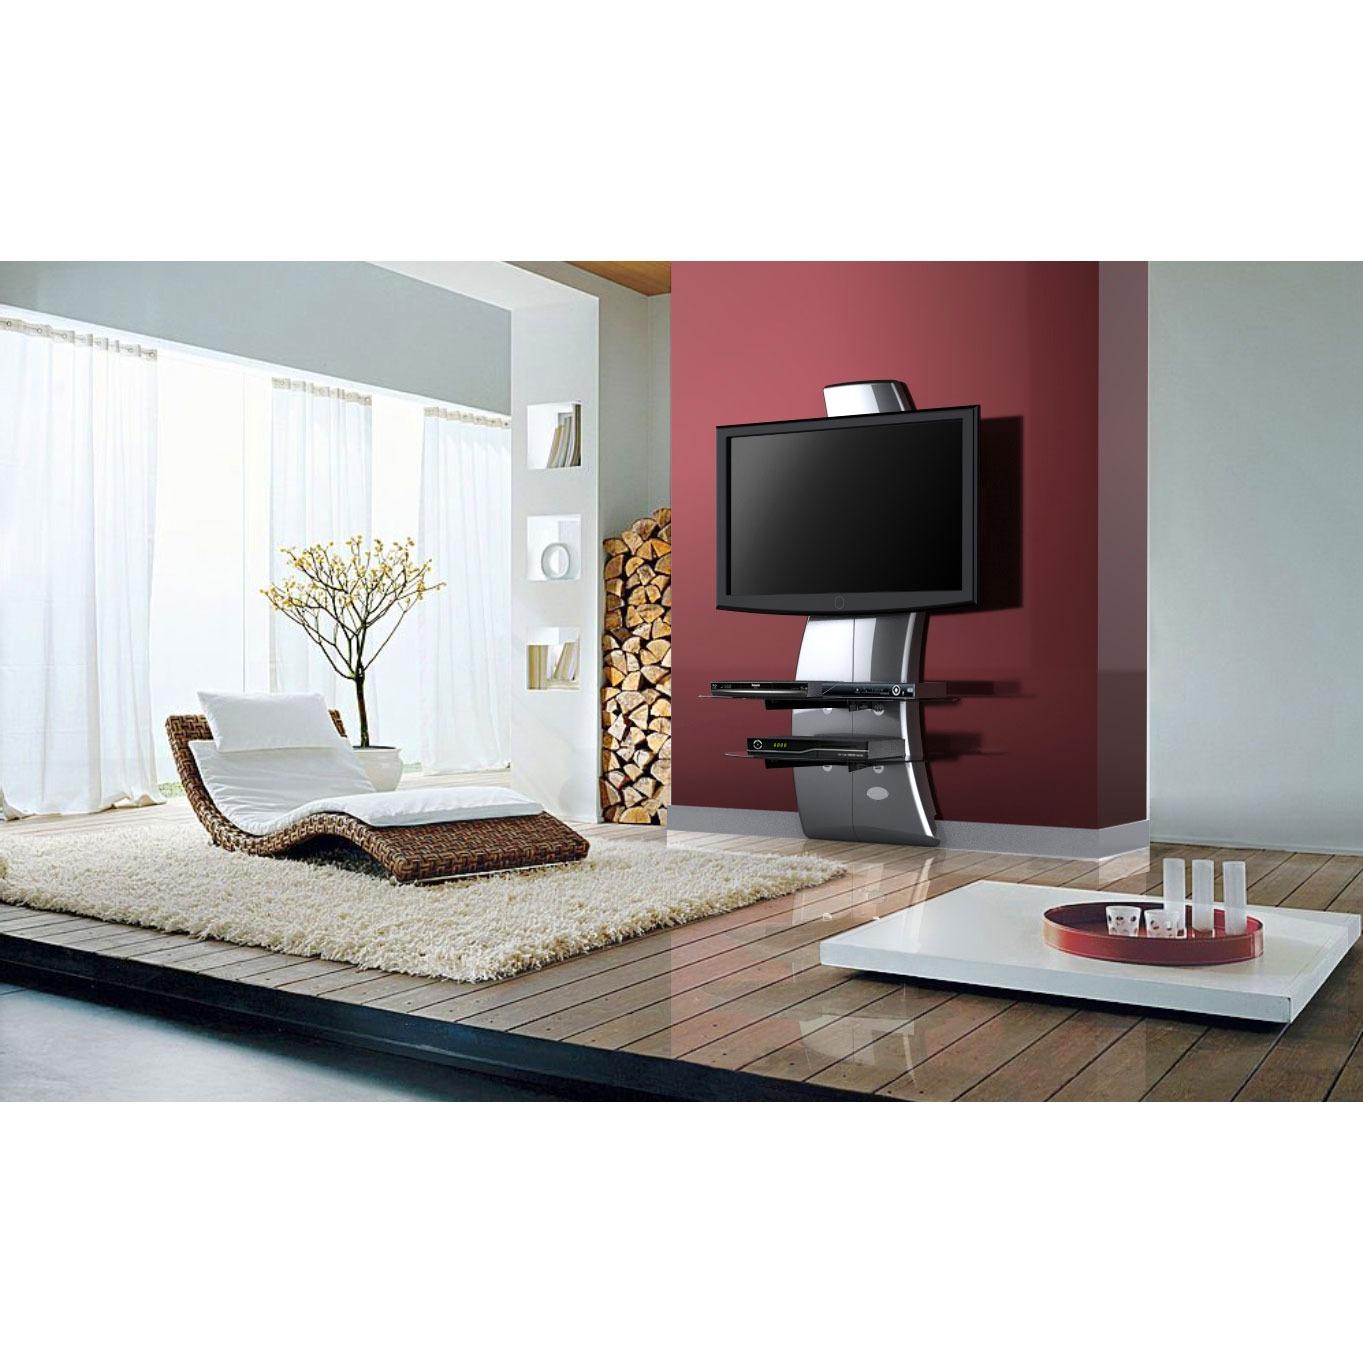 meliconi ghost design 2000 (488068) : achat / vente meuble tv sur ... - Meuble Tv Mural Meliconi Ghost Design 2000